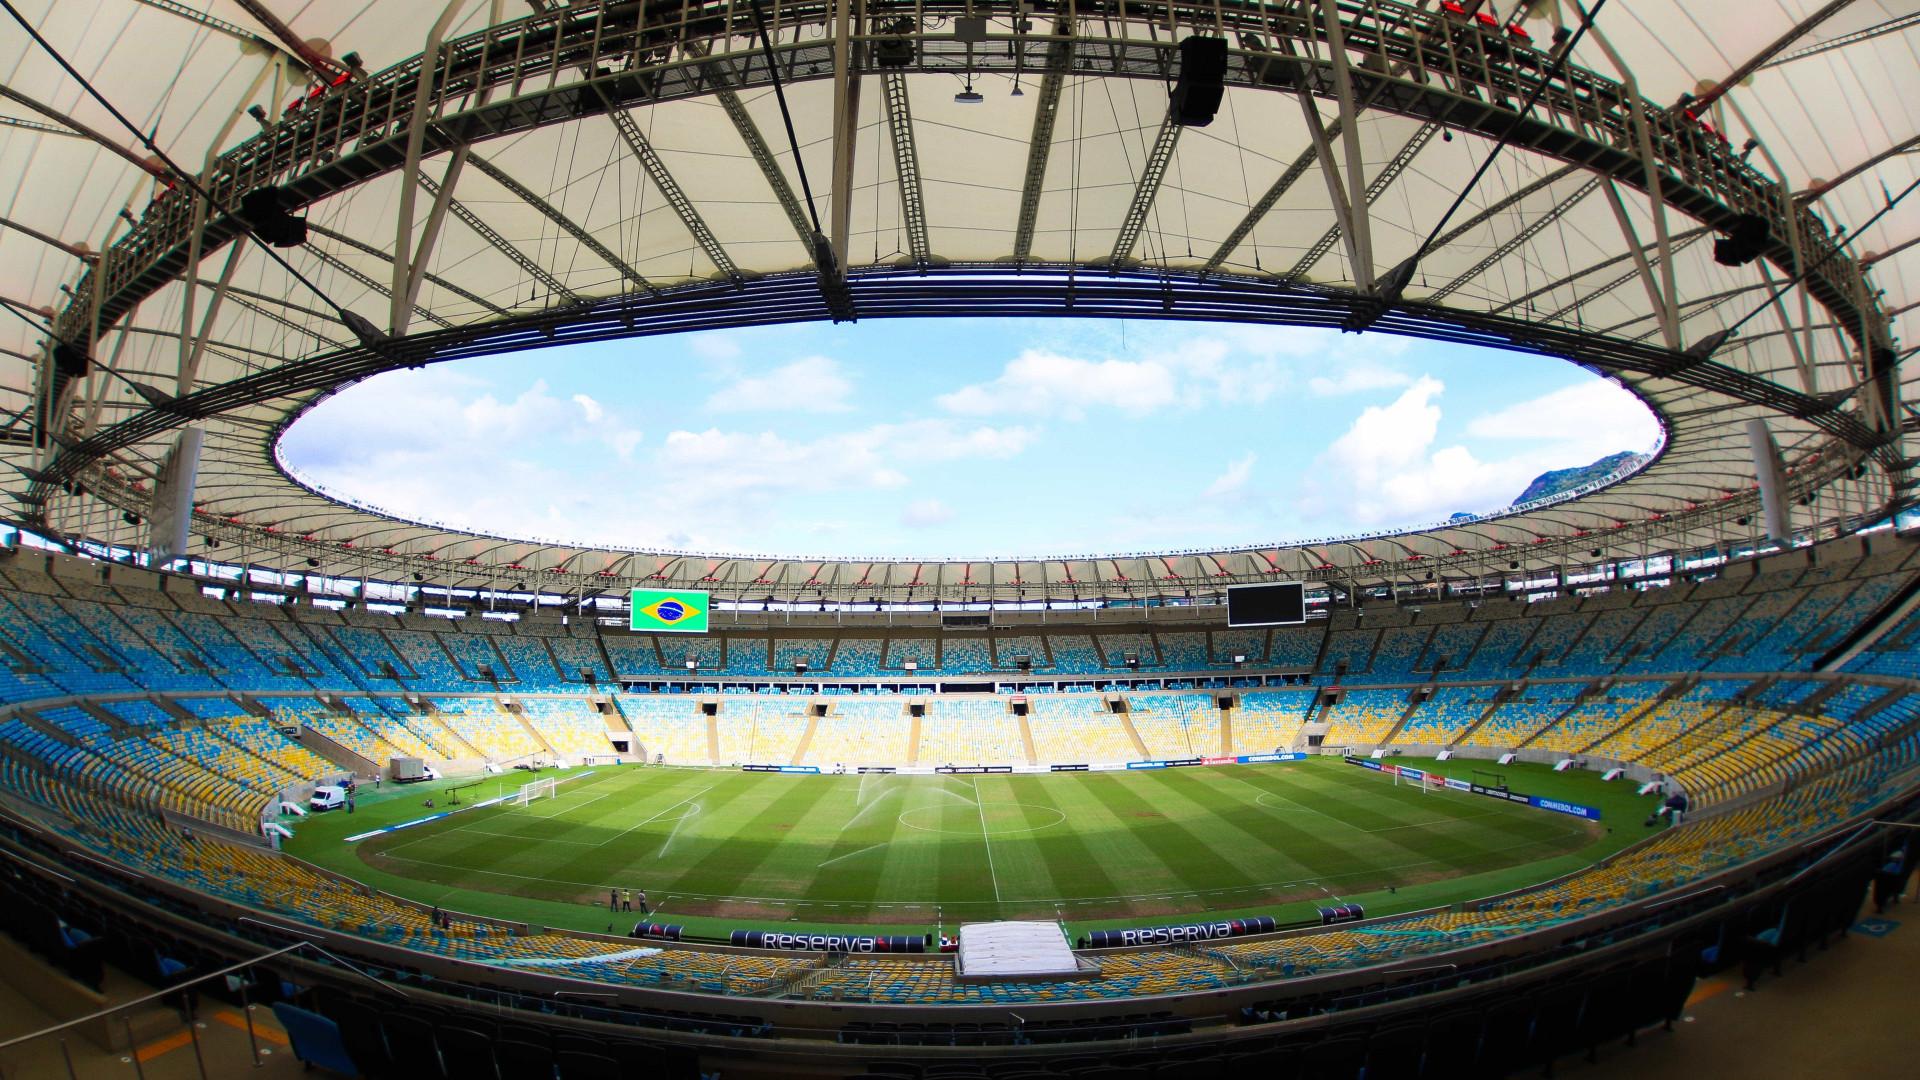 Entenda como ficou o Campeonato Carioca após regulamento confuso